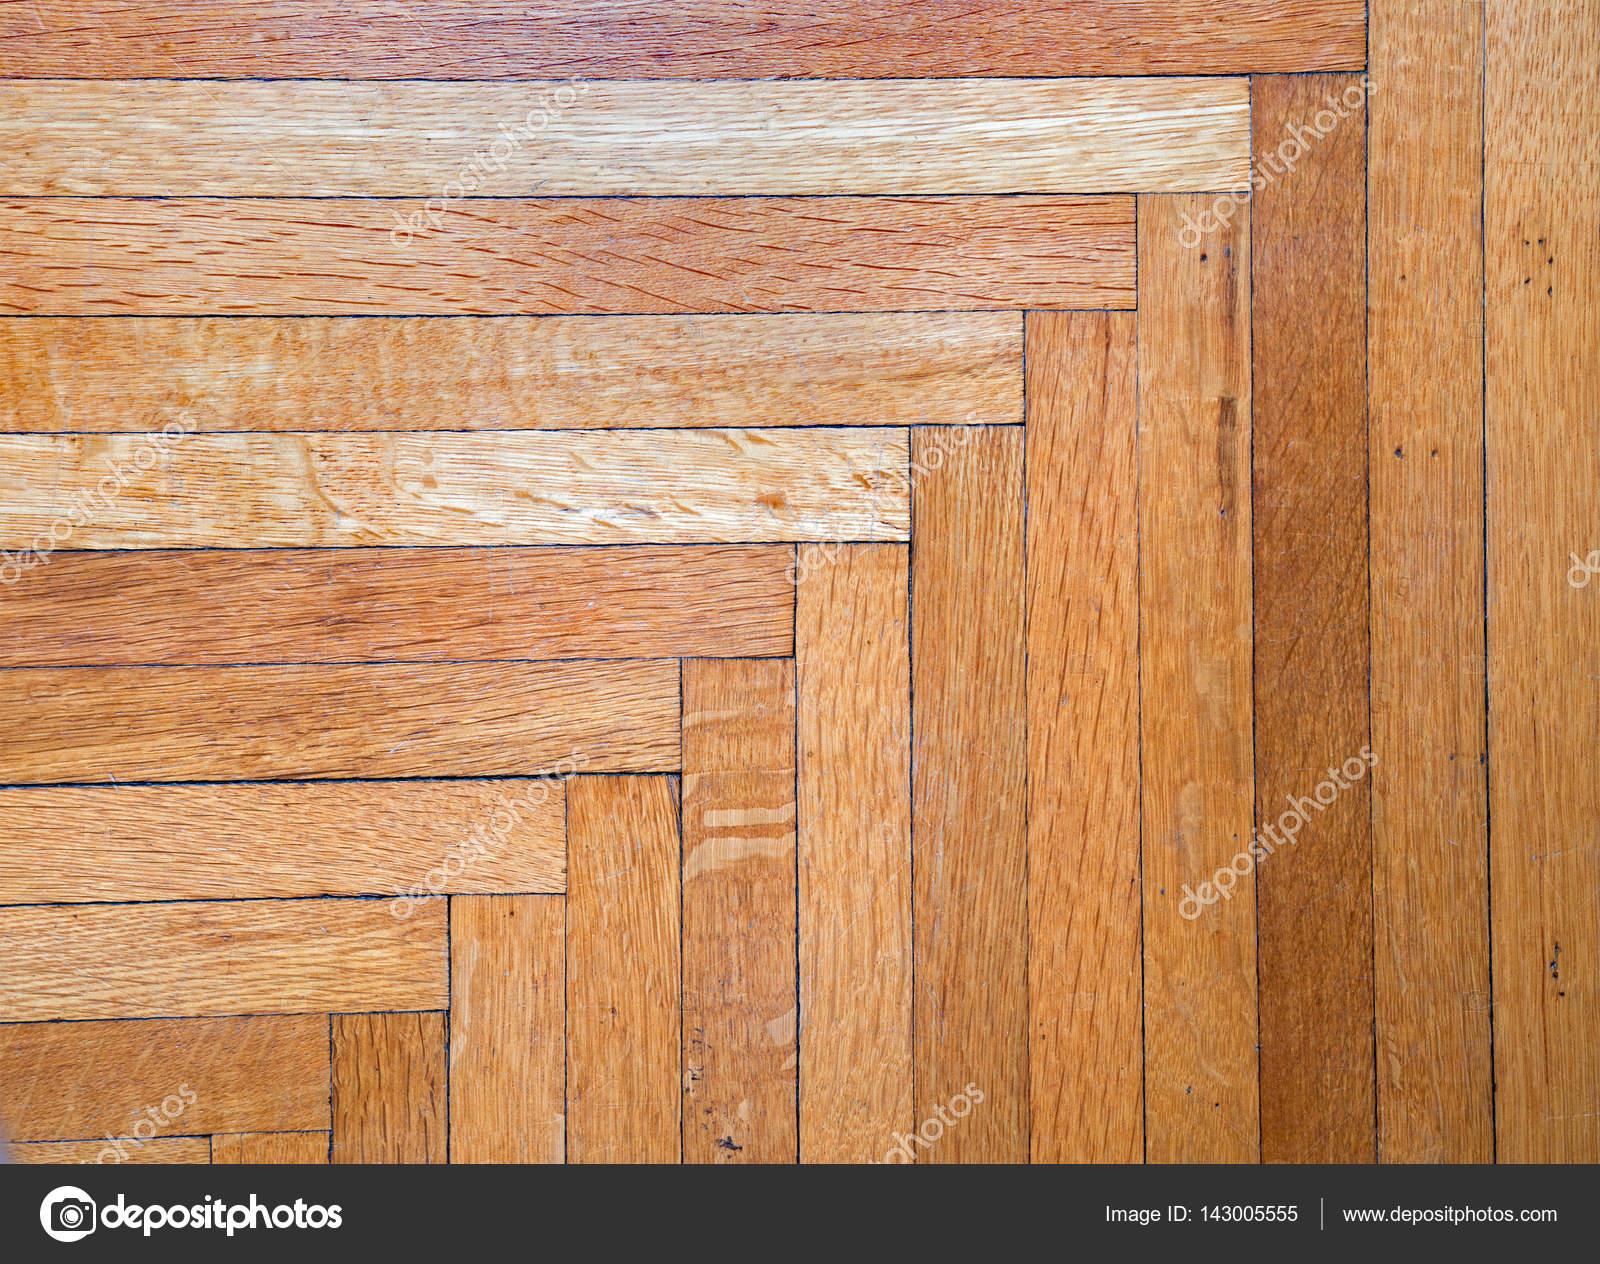 Oude Eiken Vloer : Oude eiken hardhouten vloer achtergrond u2014 stockfoto © lawcain #143005555